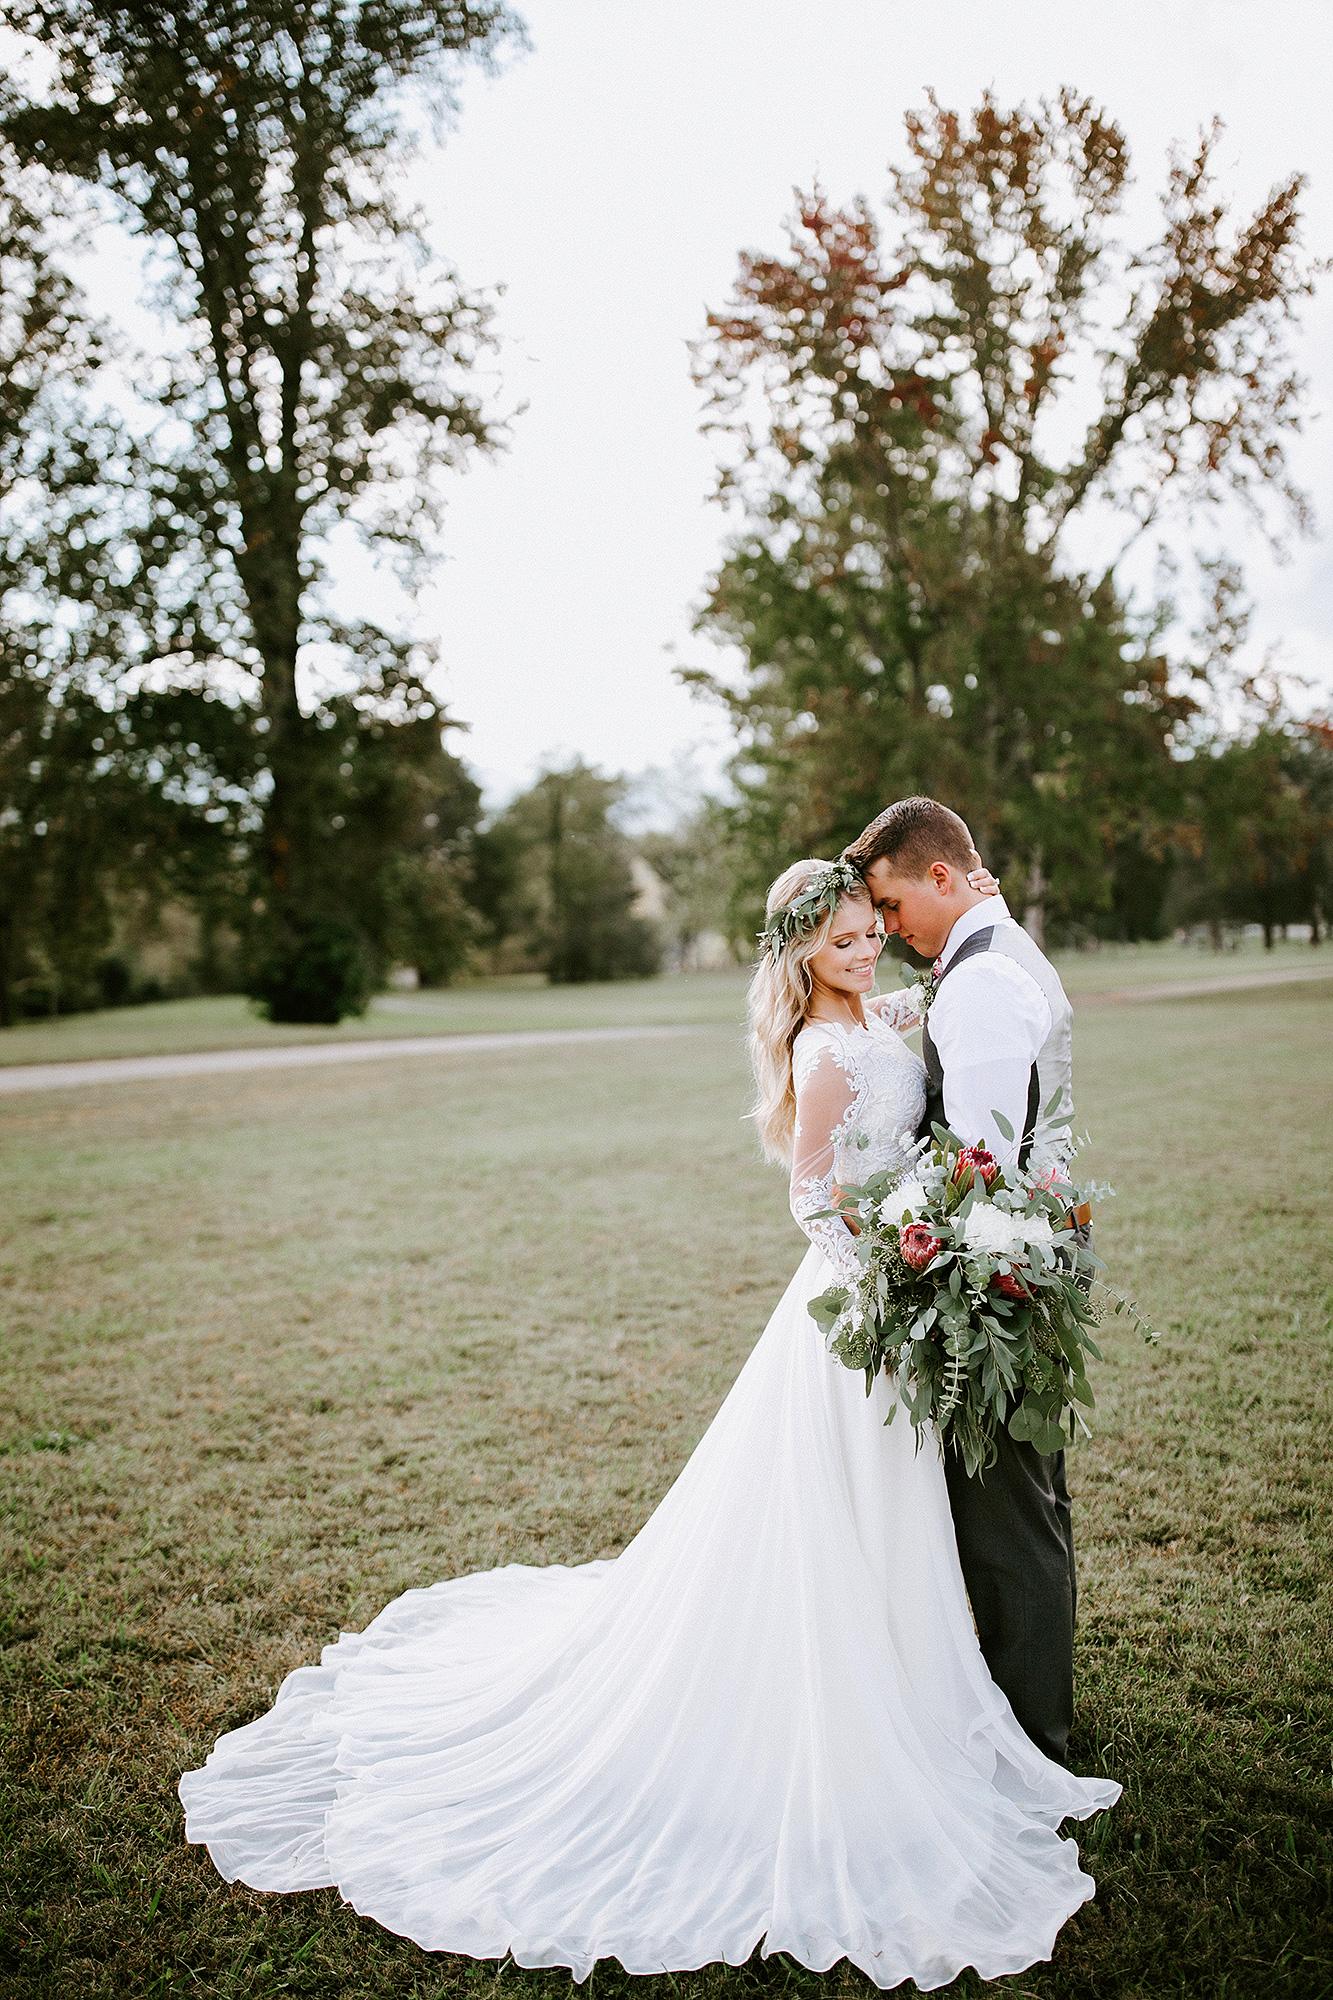 Bringing Up Bates' Josie Bates Marries Kelton Balka